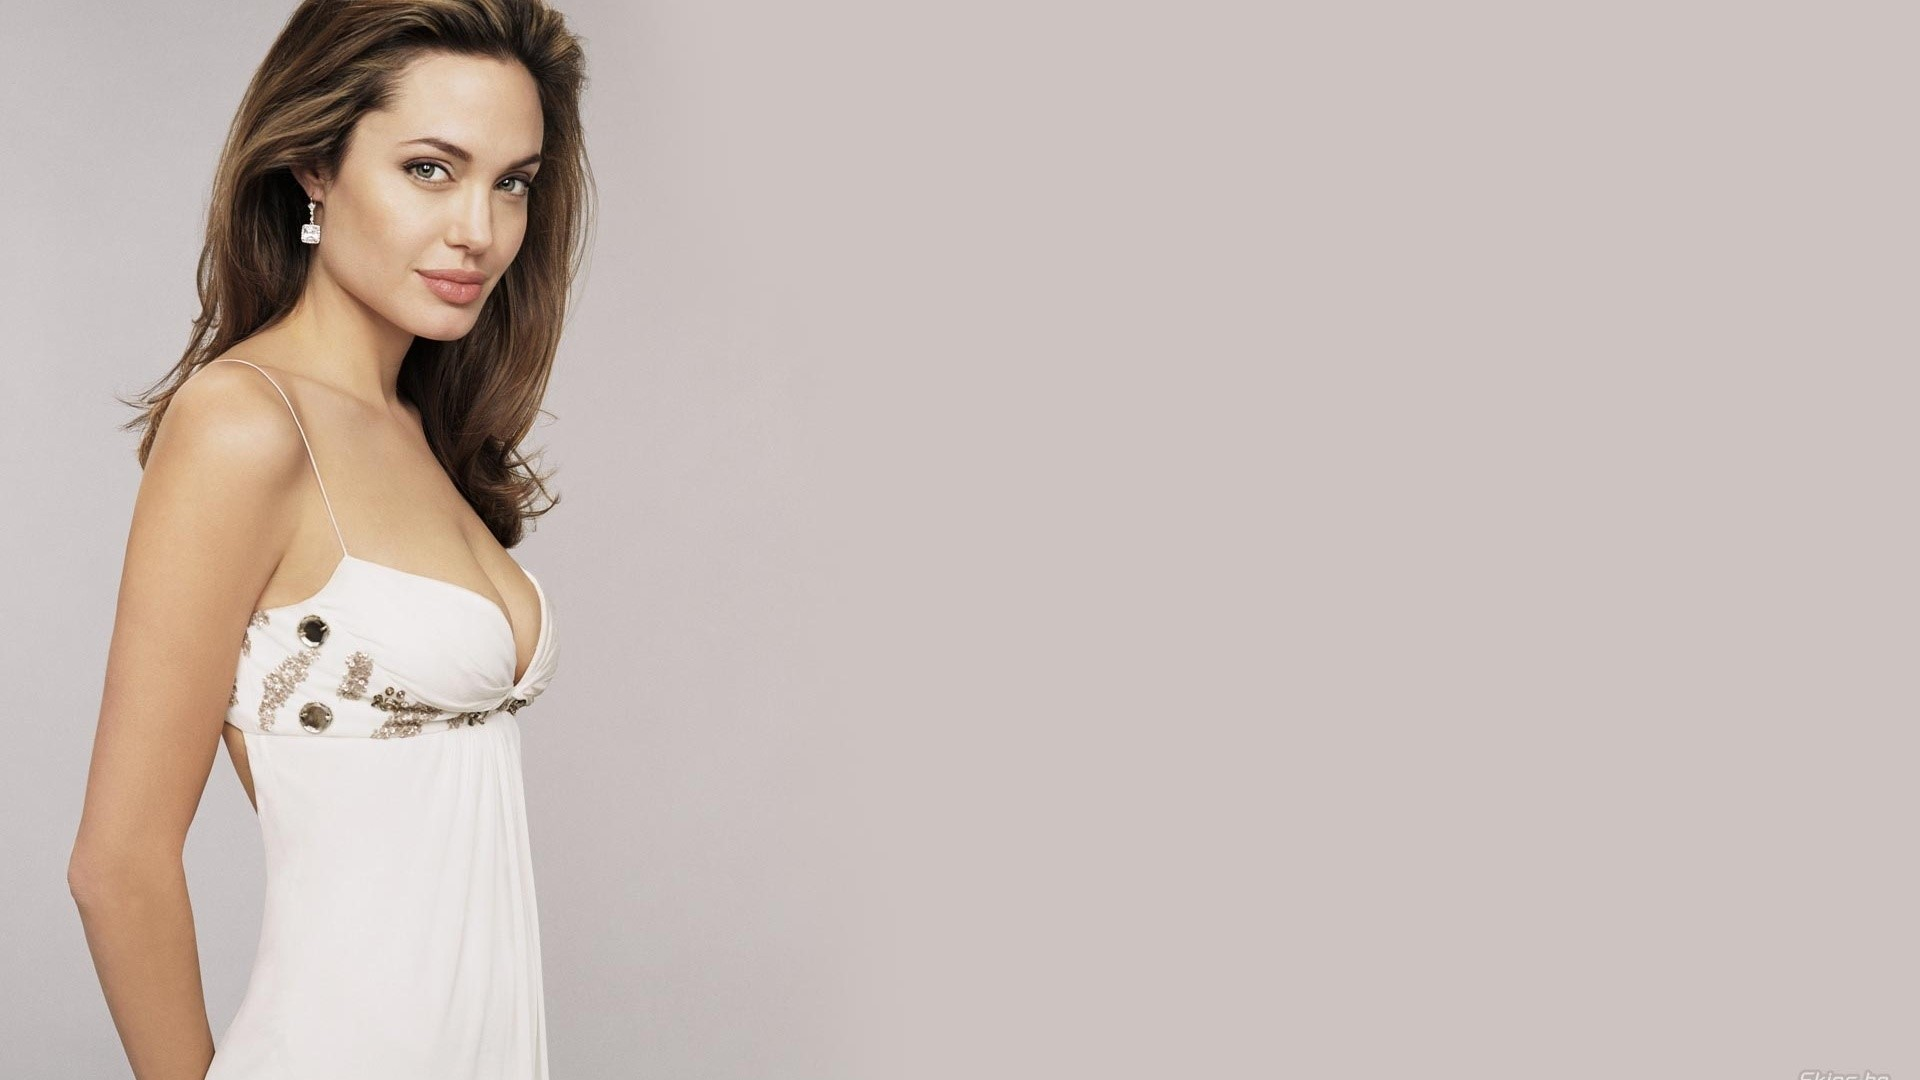 Angelina Jolie High Definition